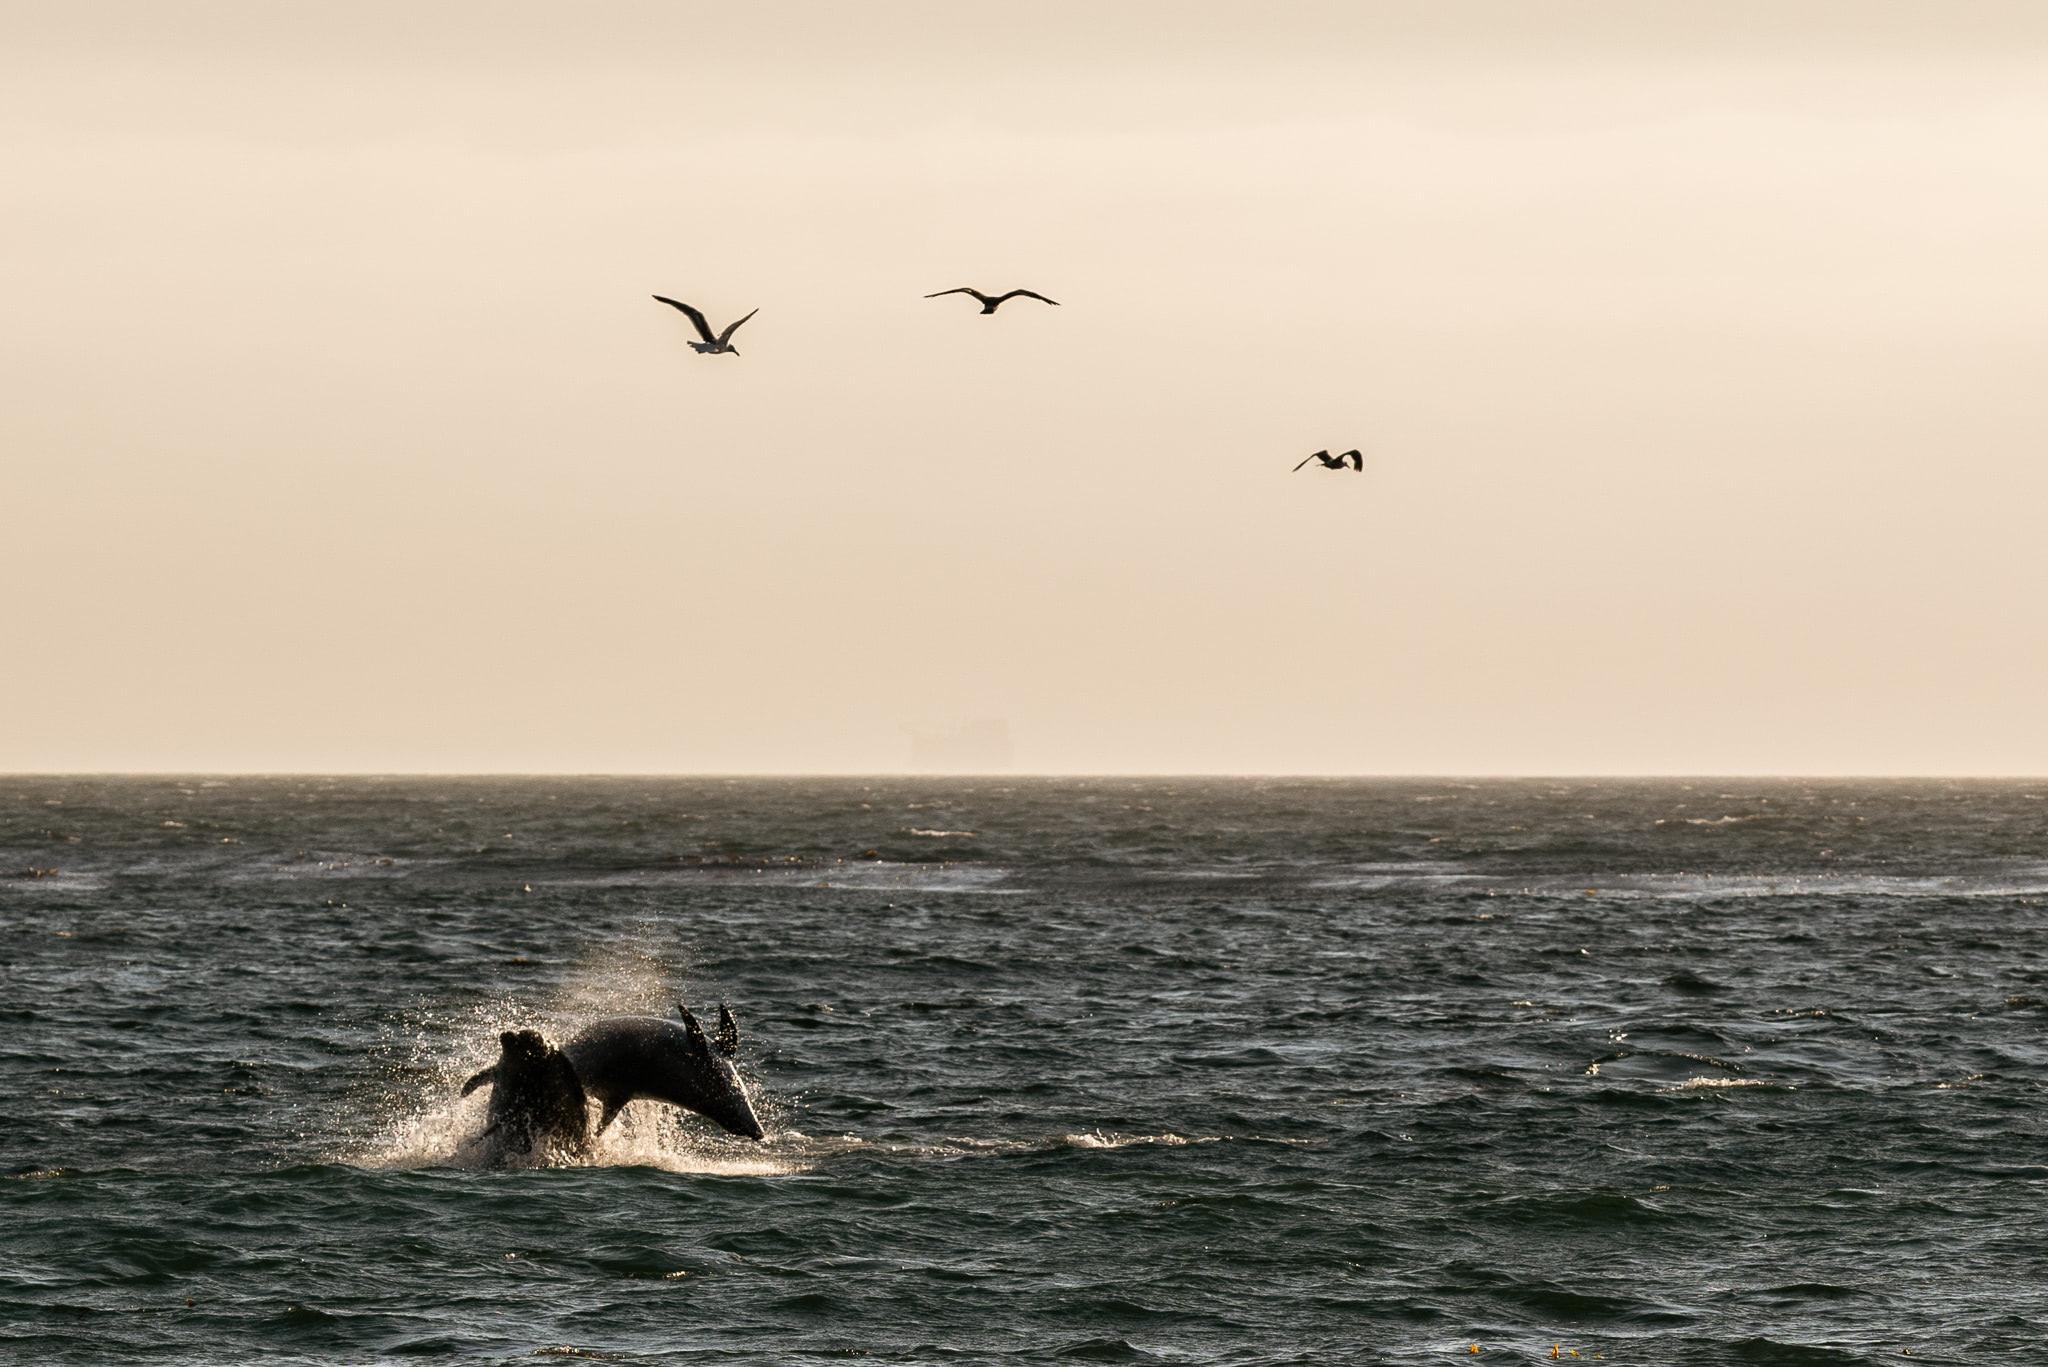 Dolphins feasting on fish near shore Jalama beach.